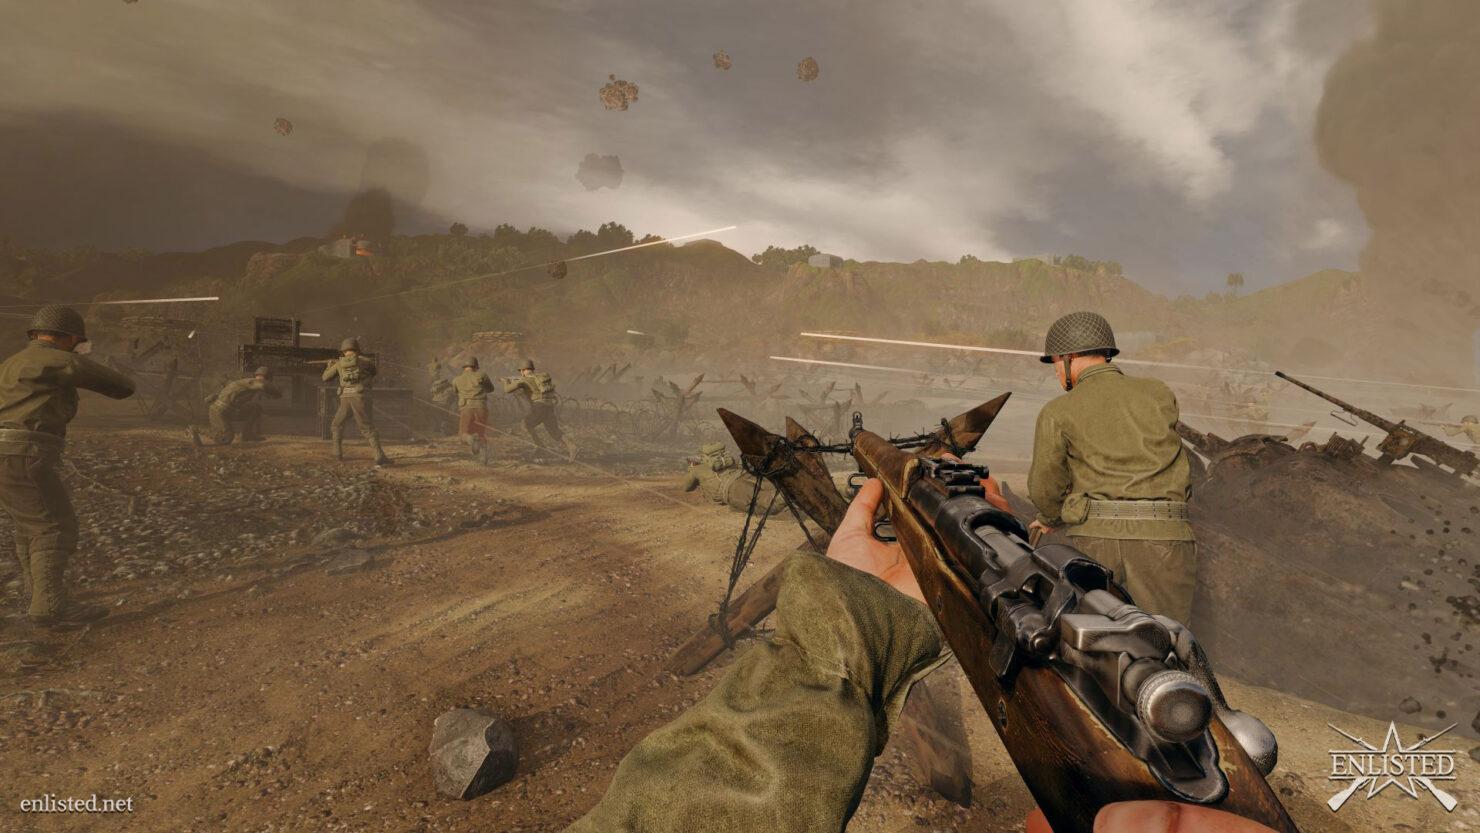 enlisted_screenshot_5